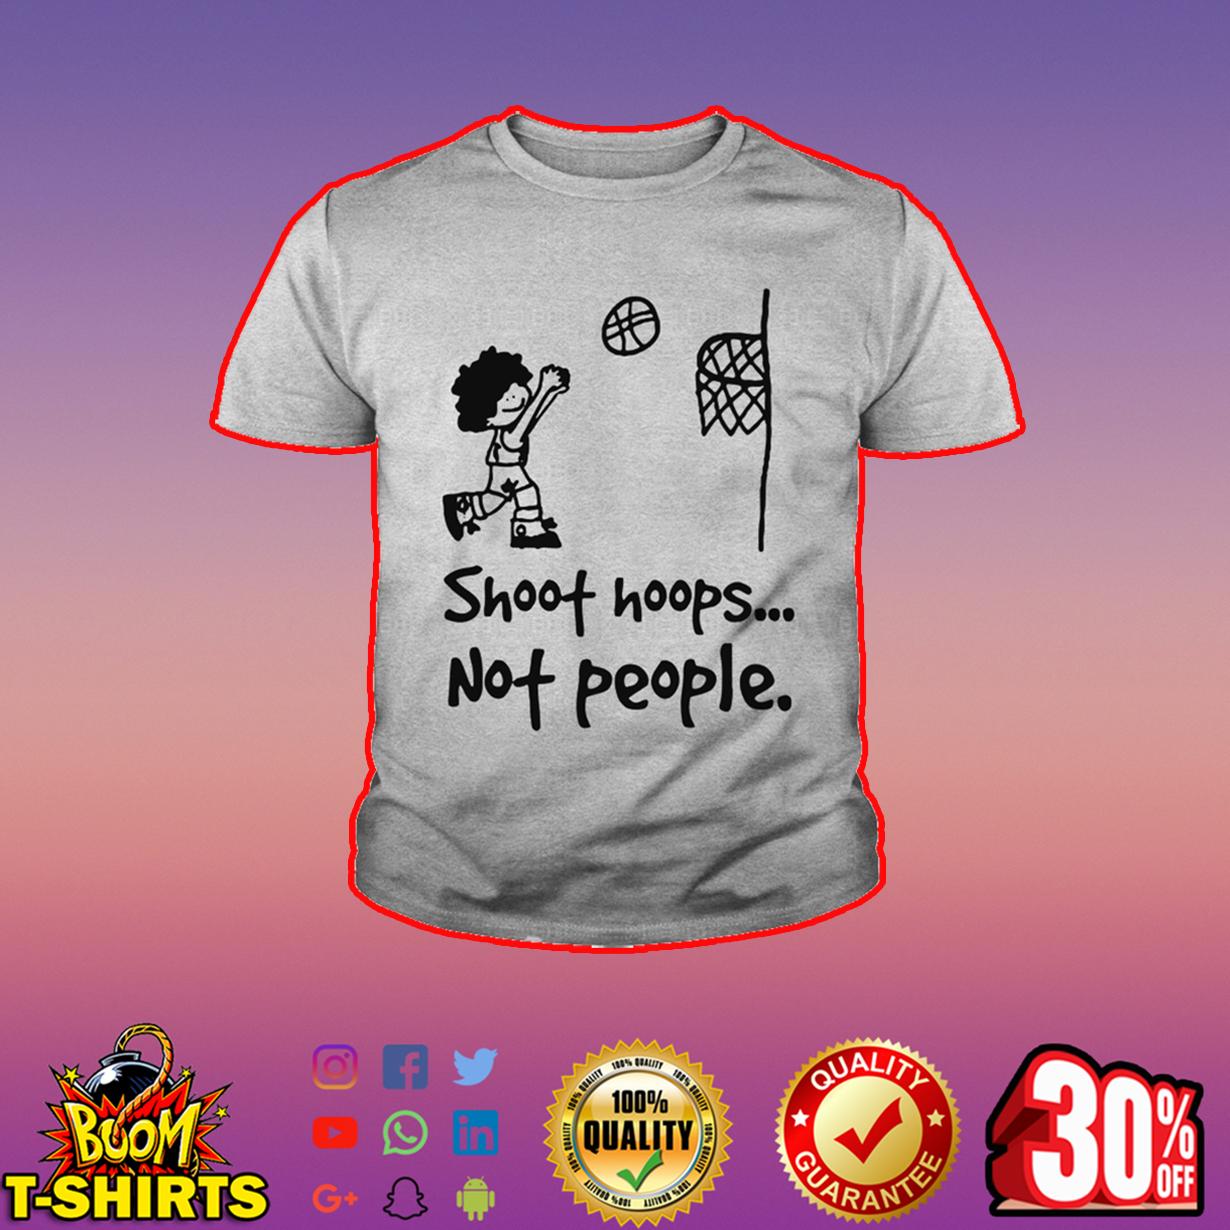 Shoot hoops not people youth tee